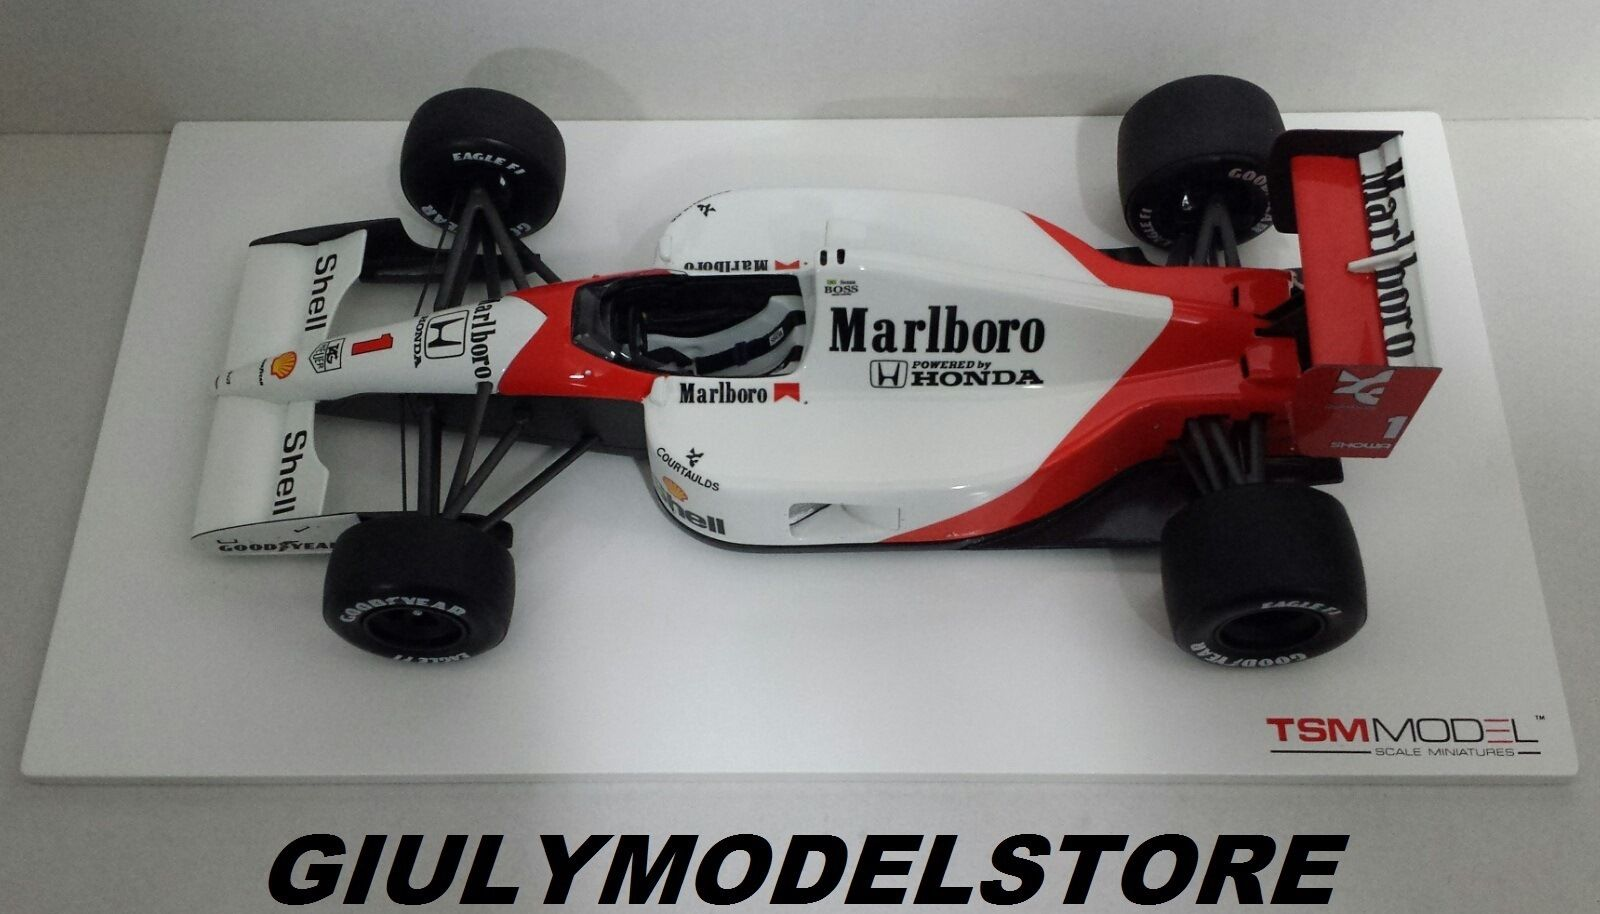 TRUESCALE 1:18 TSM - MCLAREN HONDA MP4/6 AYRTON SENNA 2ND JAPANESE GP 1991 RARE